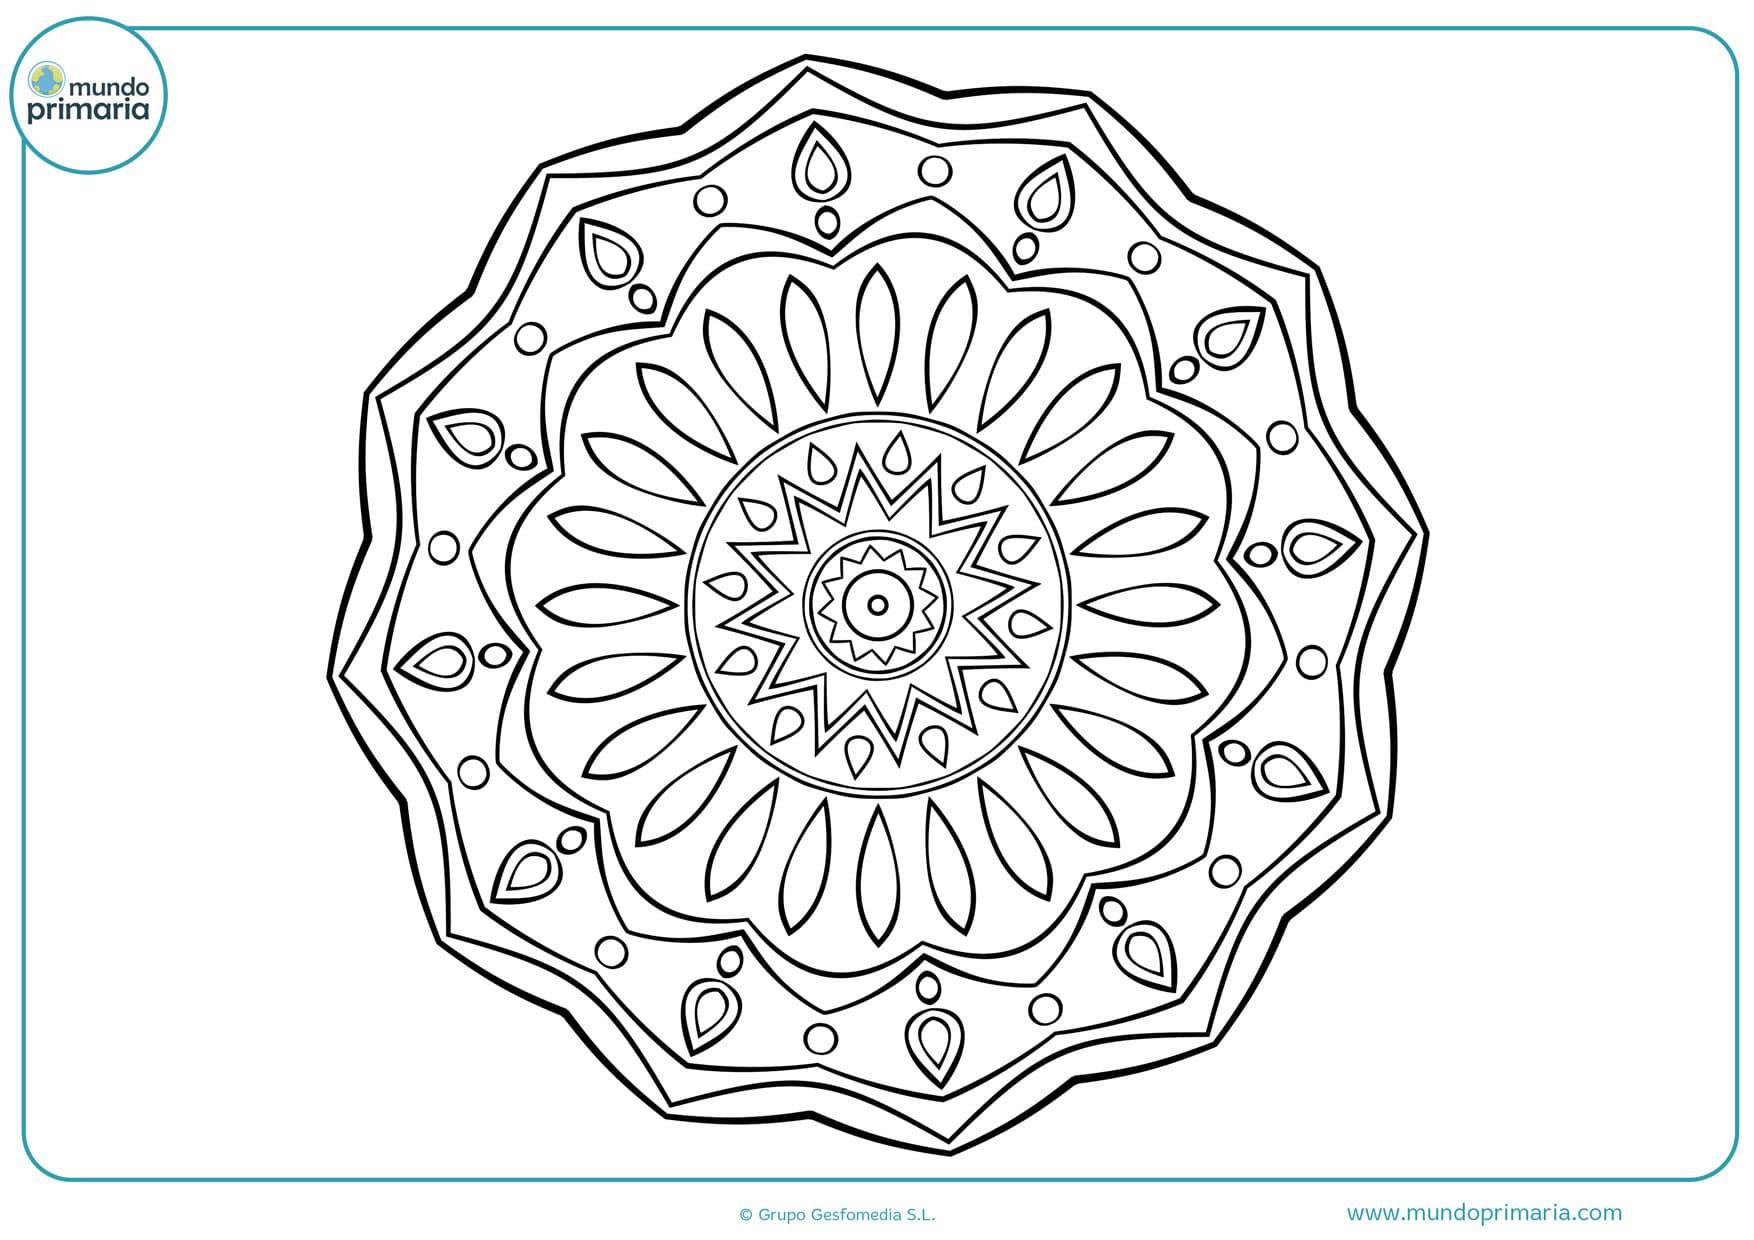 Dibujos de mandalas para colorear para ni os 2018 for Mandalas ninos